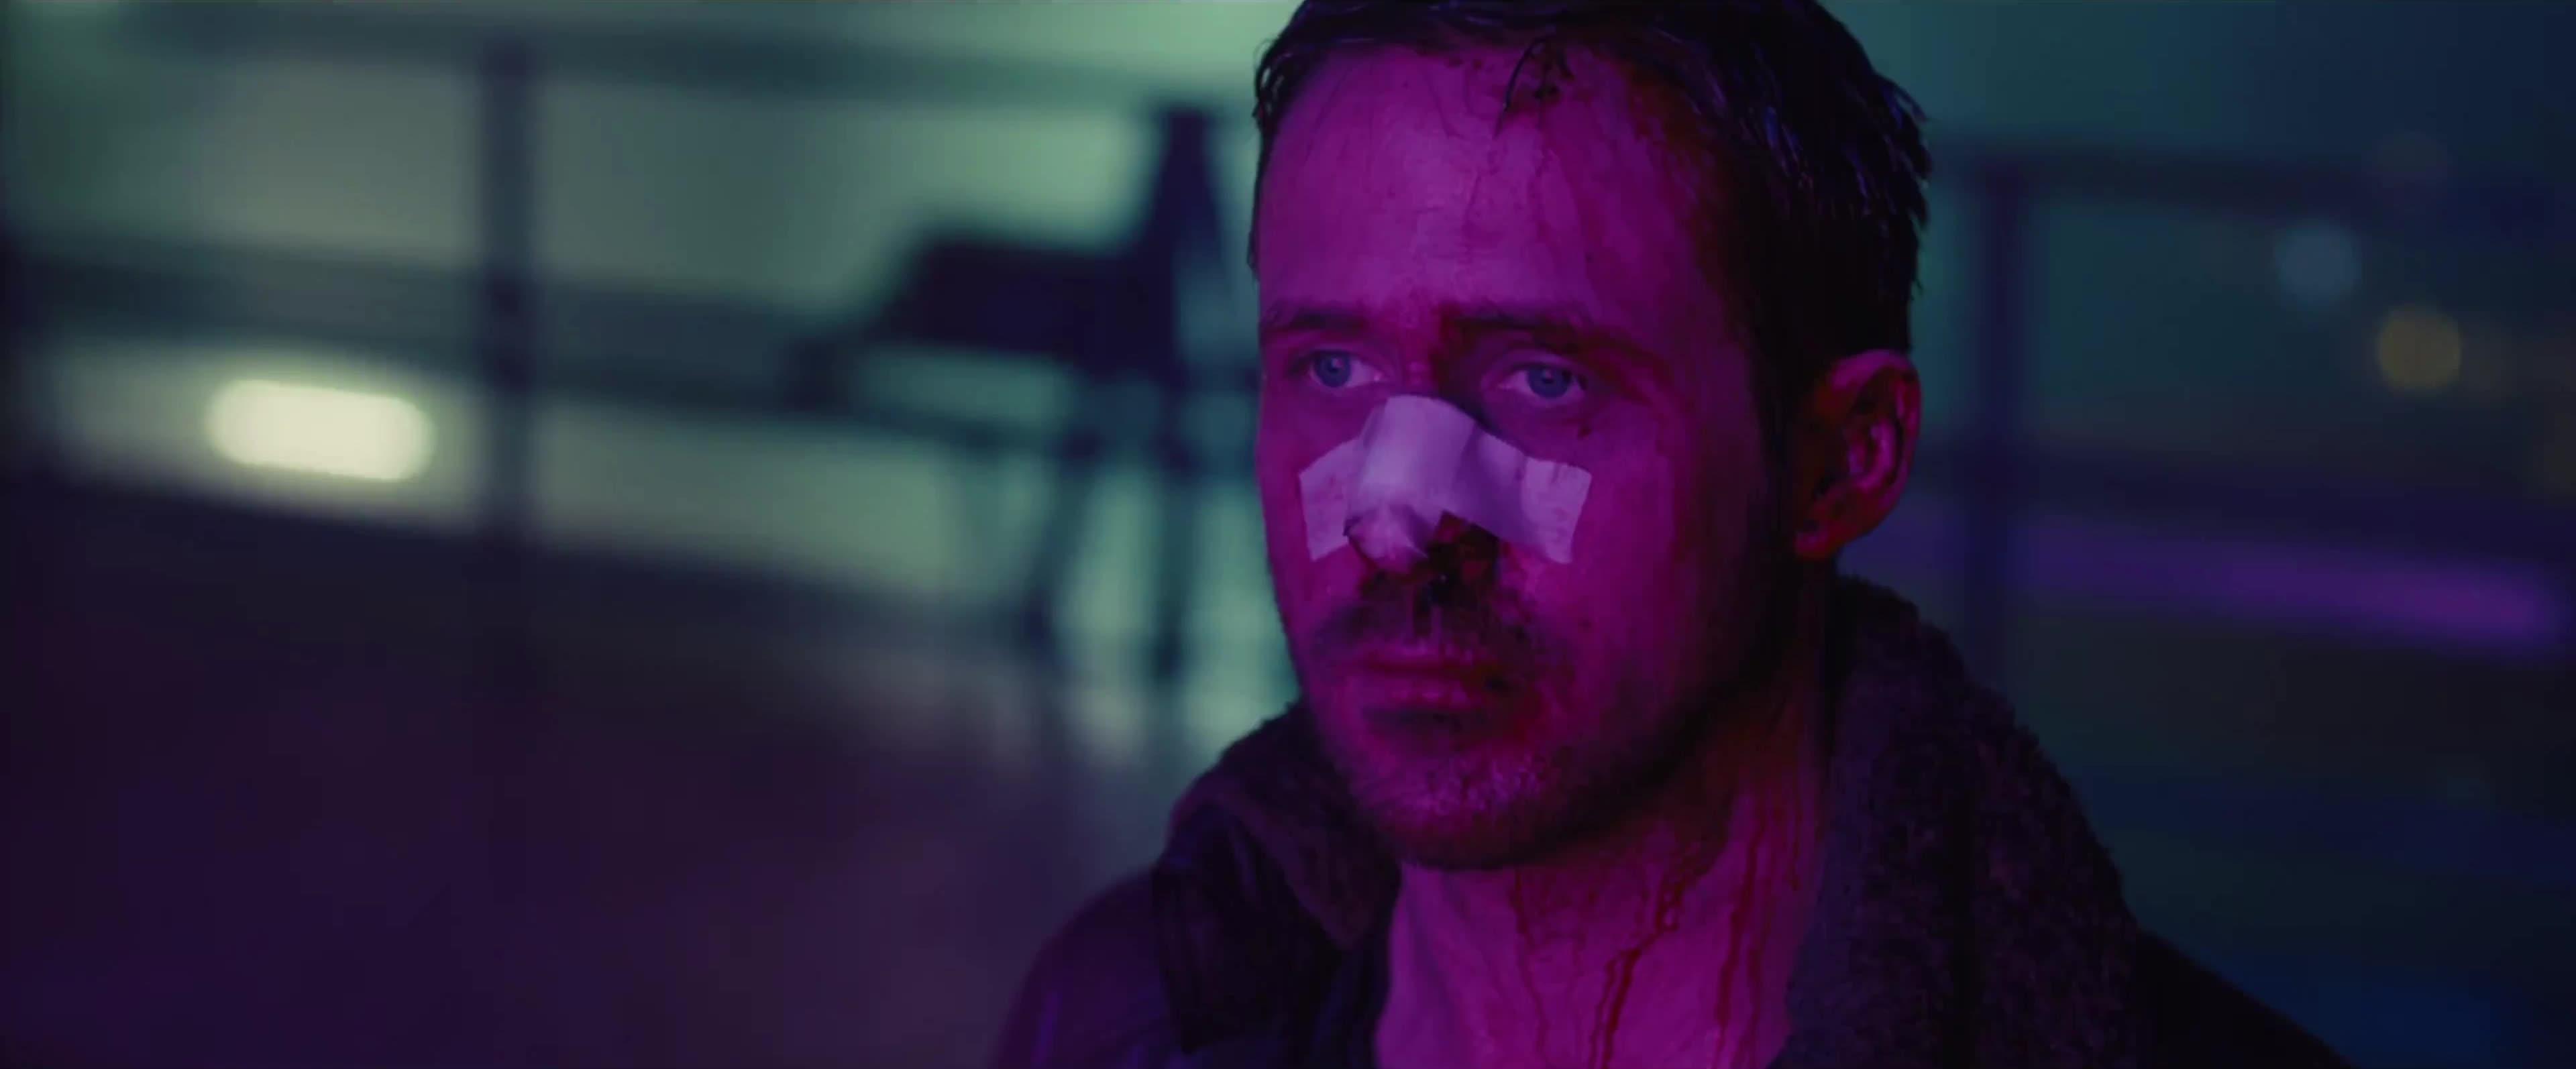 blade runner 2049, lonely, ryan gosling, Look Like A Good Joe Blade Runner 2049 GIFs